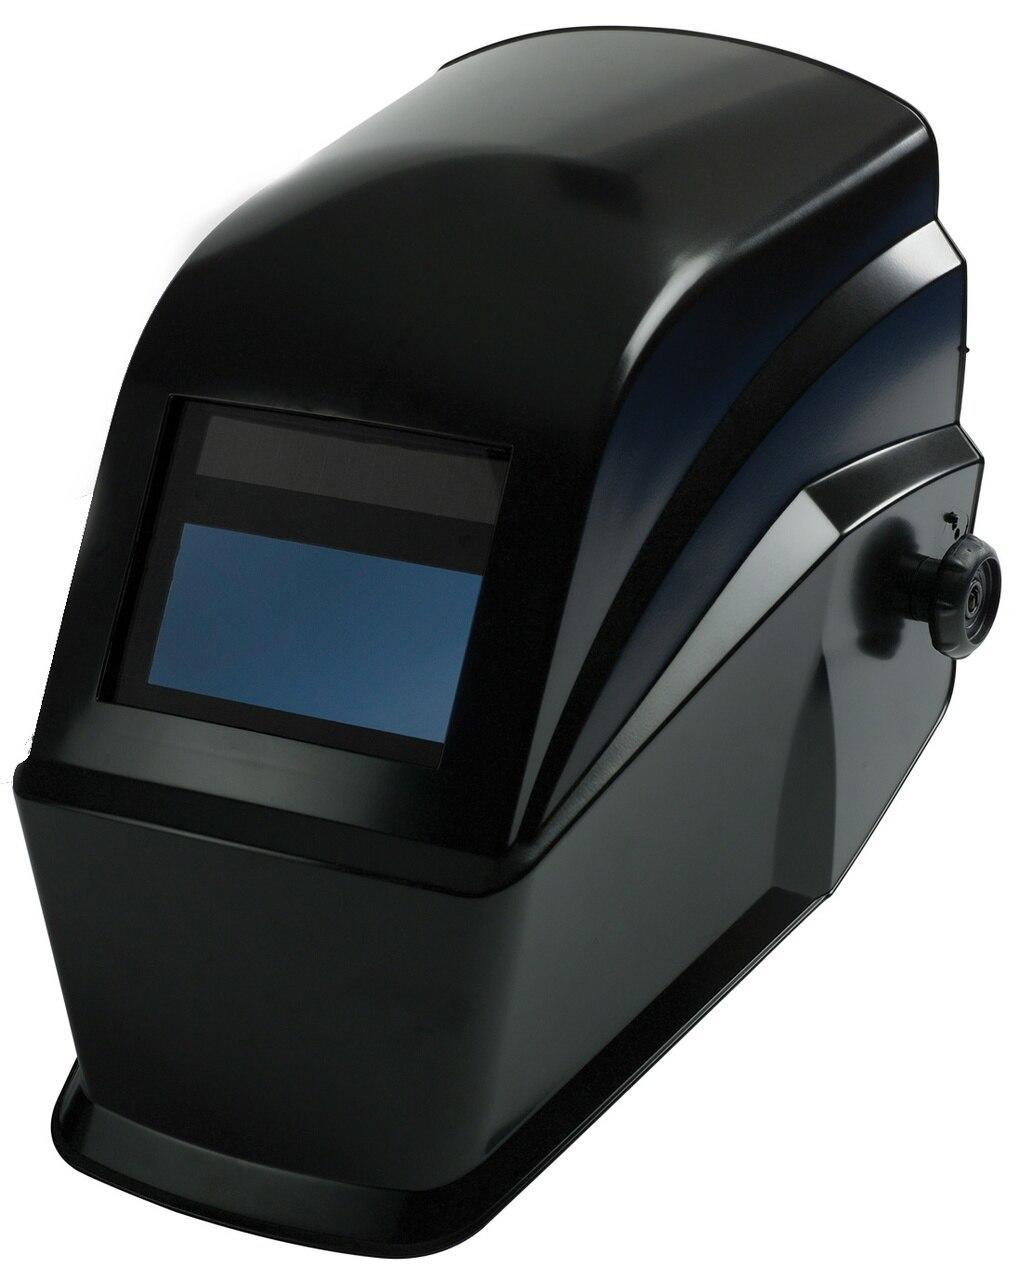 Jackson Nitro Drill Down Variable ADF - Black 36633